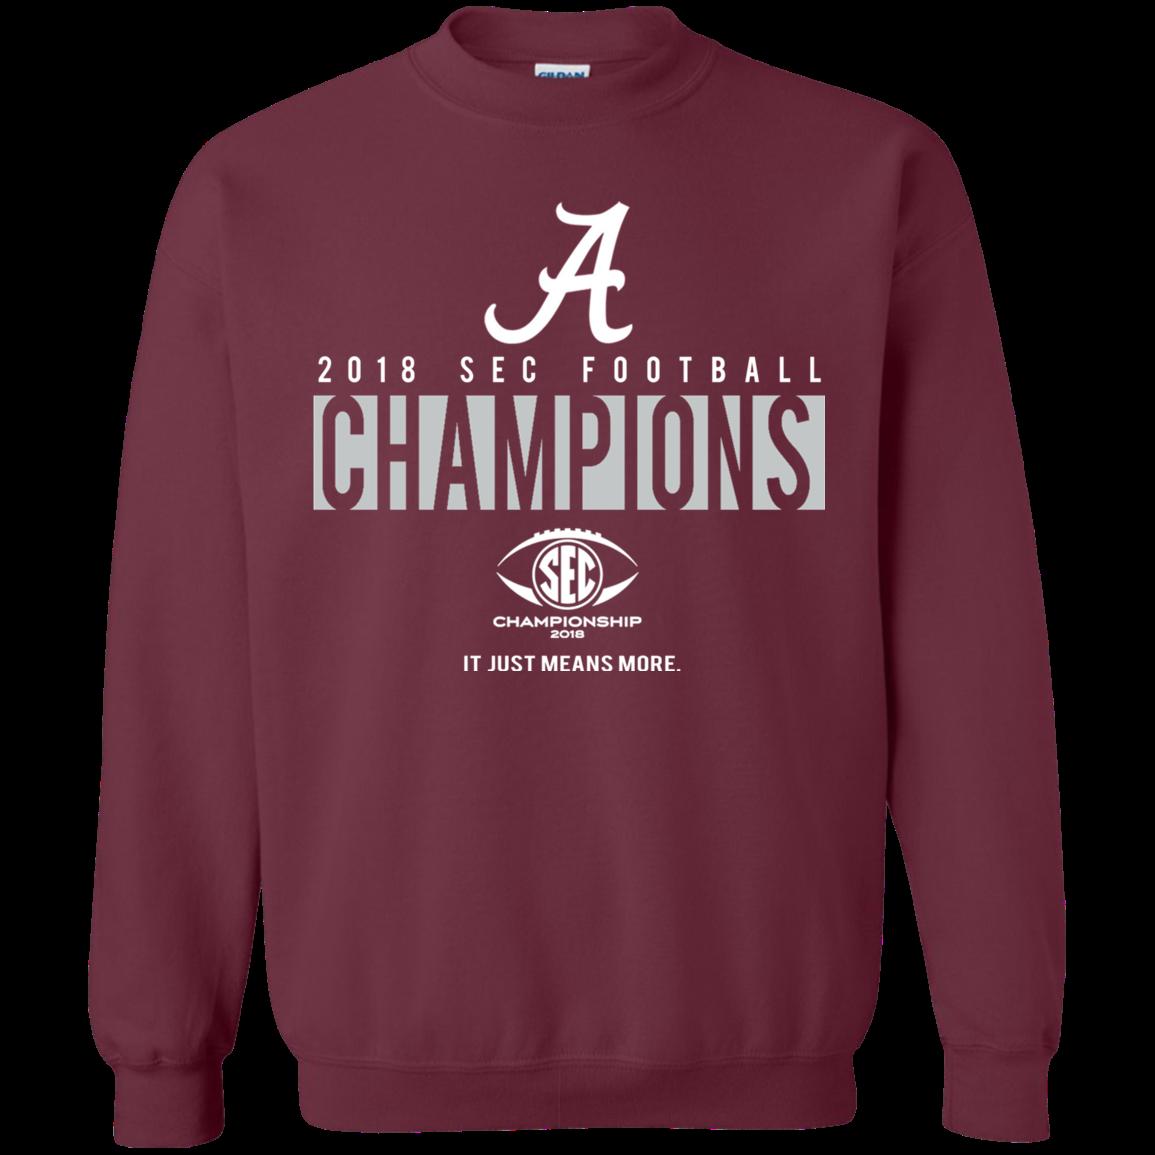 Alabama Crimson Tide Sec Championship Sweatshirt Maroon Shipping Worldwide Ninonine Alabama Crimson Tide Sweatshirts Crimson Tide [ 1155 x 1155 Pixel ]